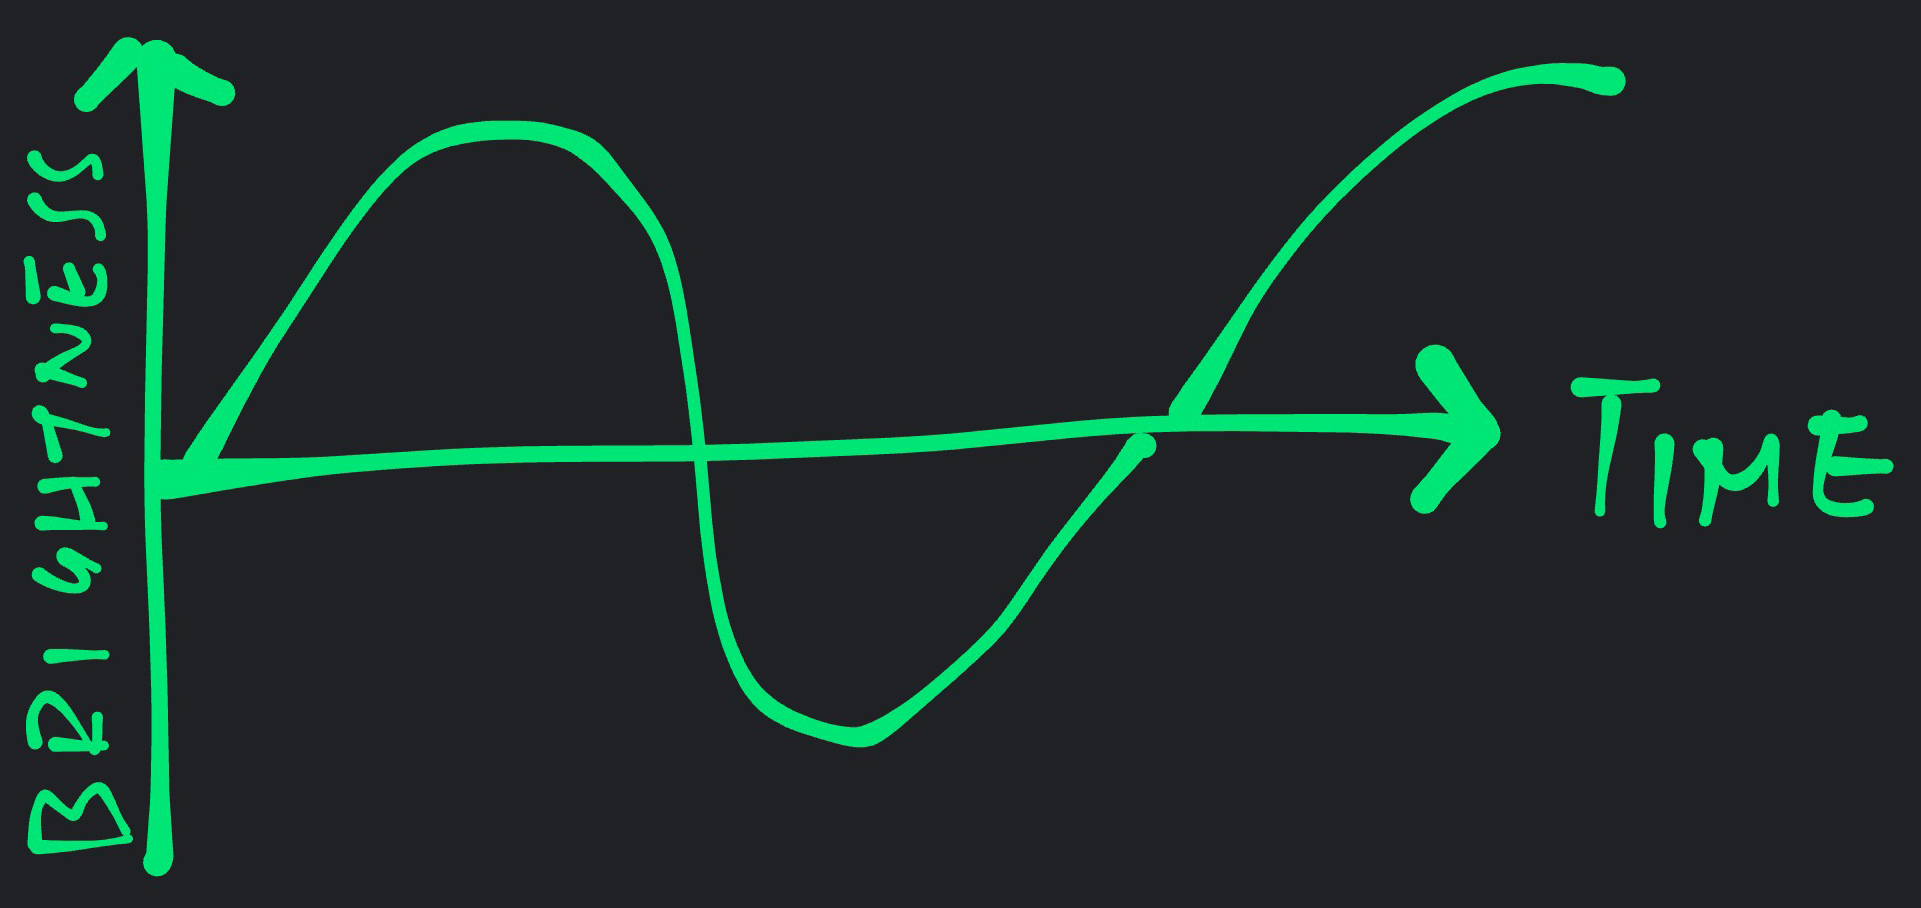 Wavy Curve